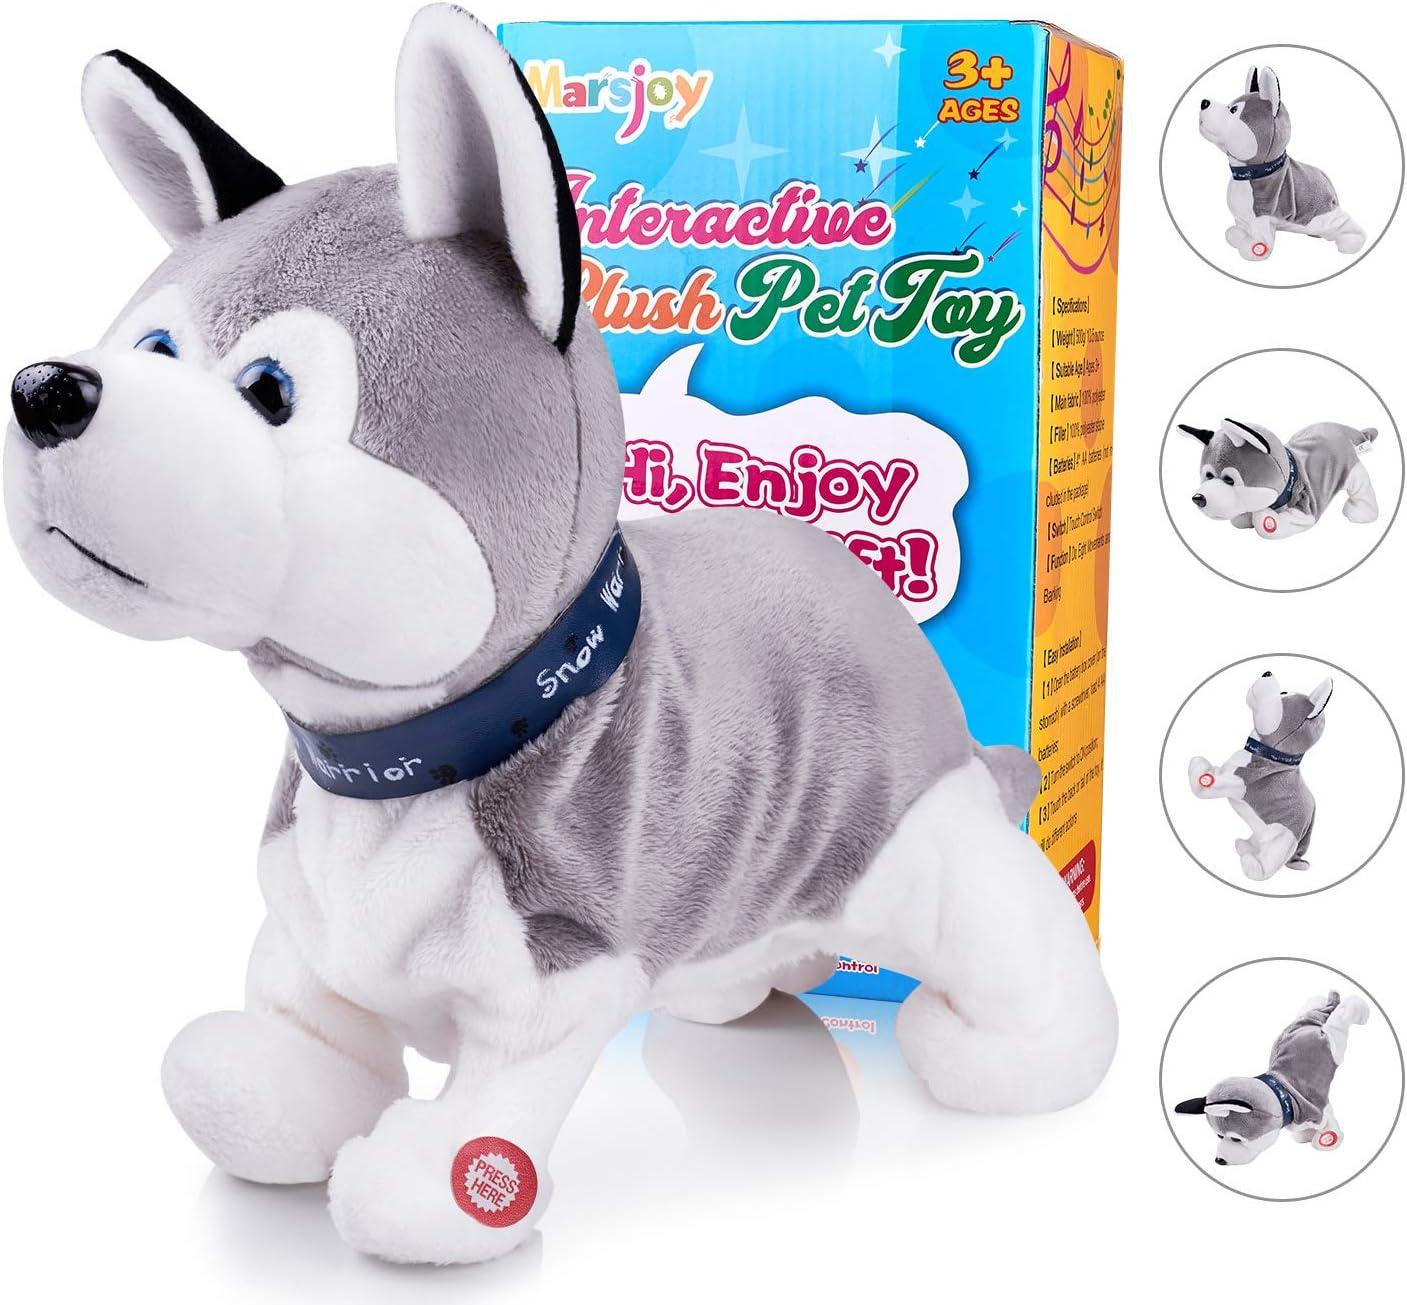 Interactive Pets Stuffed Animals Home-X Plush Dalmatian Pup Electric Dog Toys